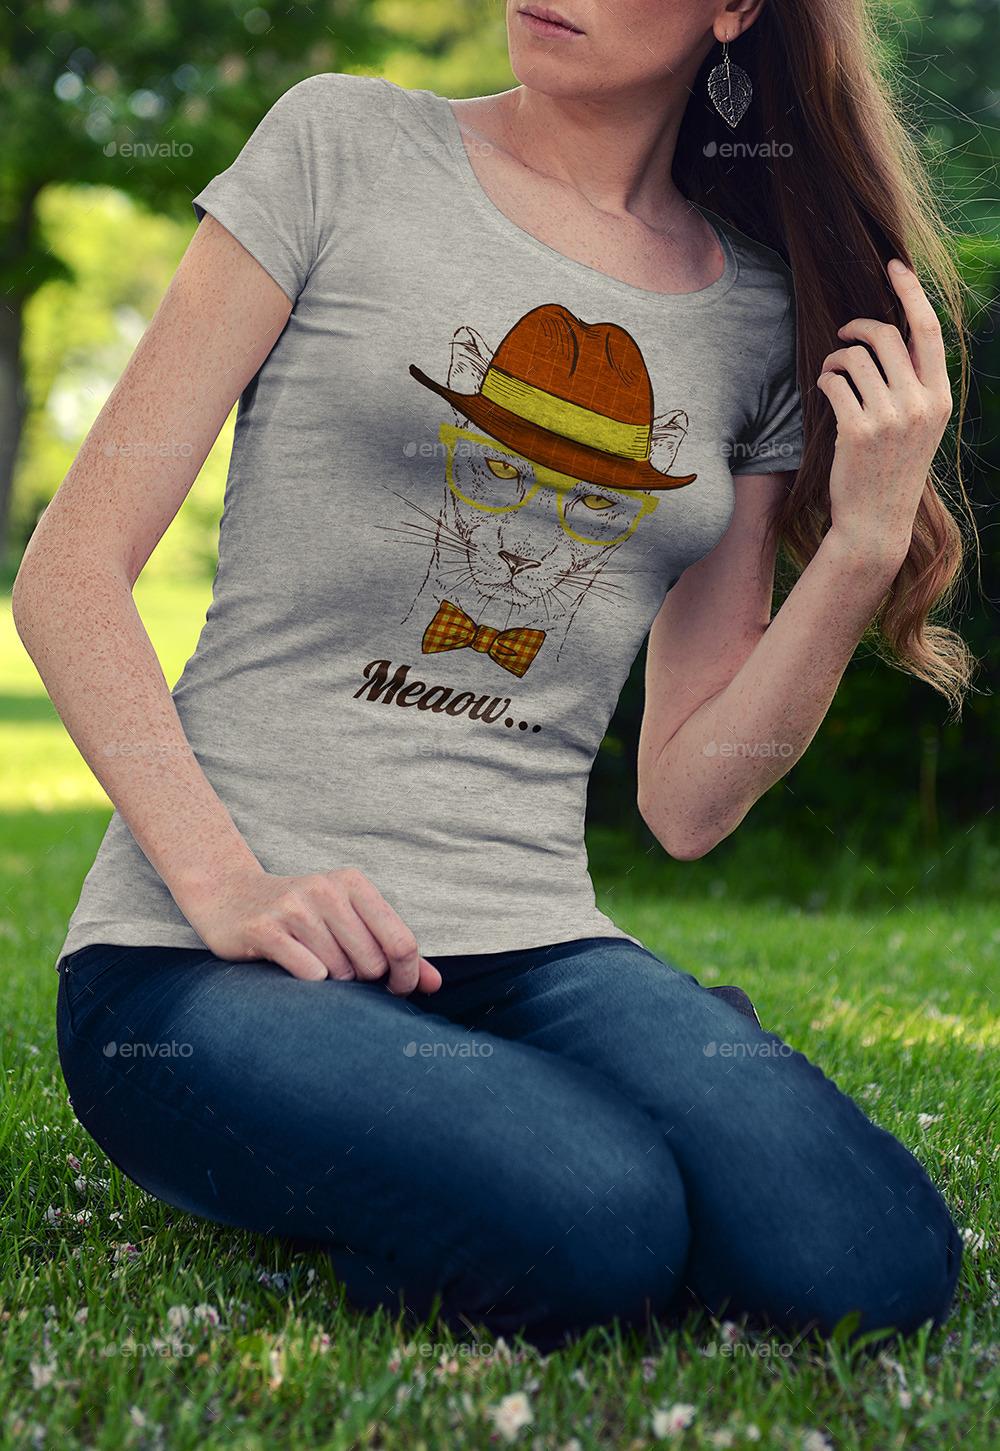 photorealistic t shirt mockup